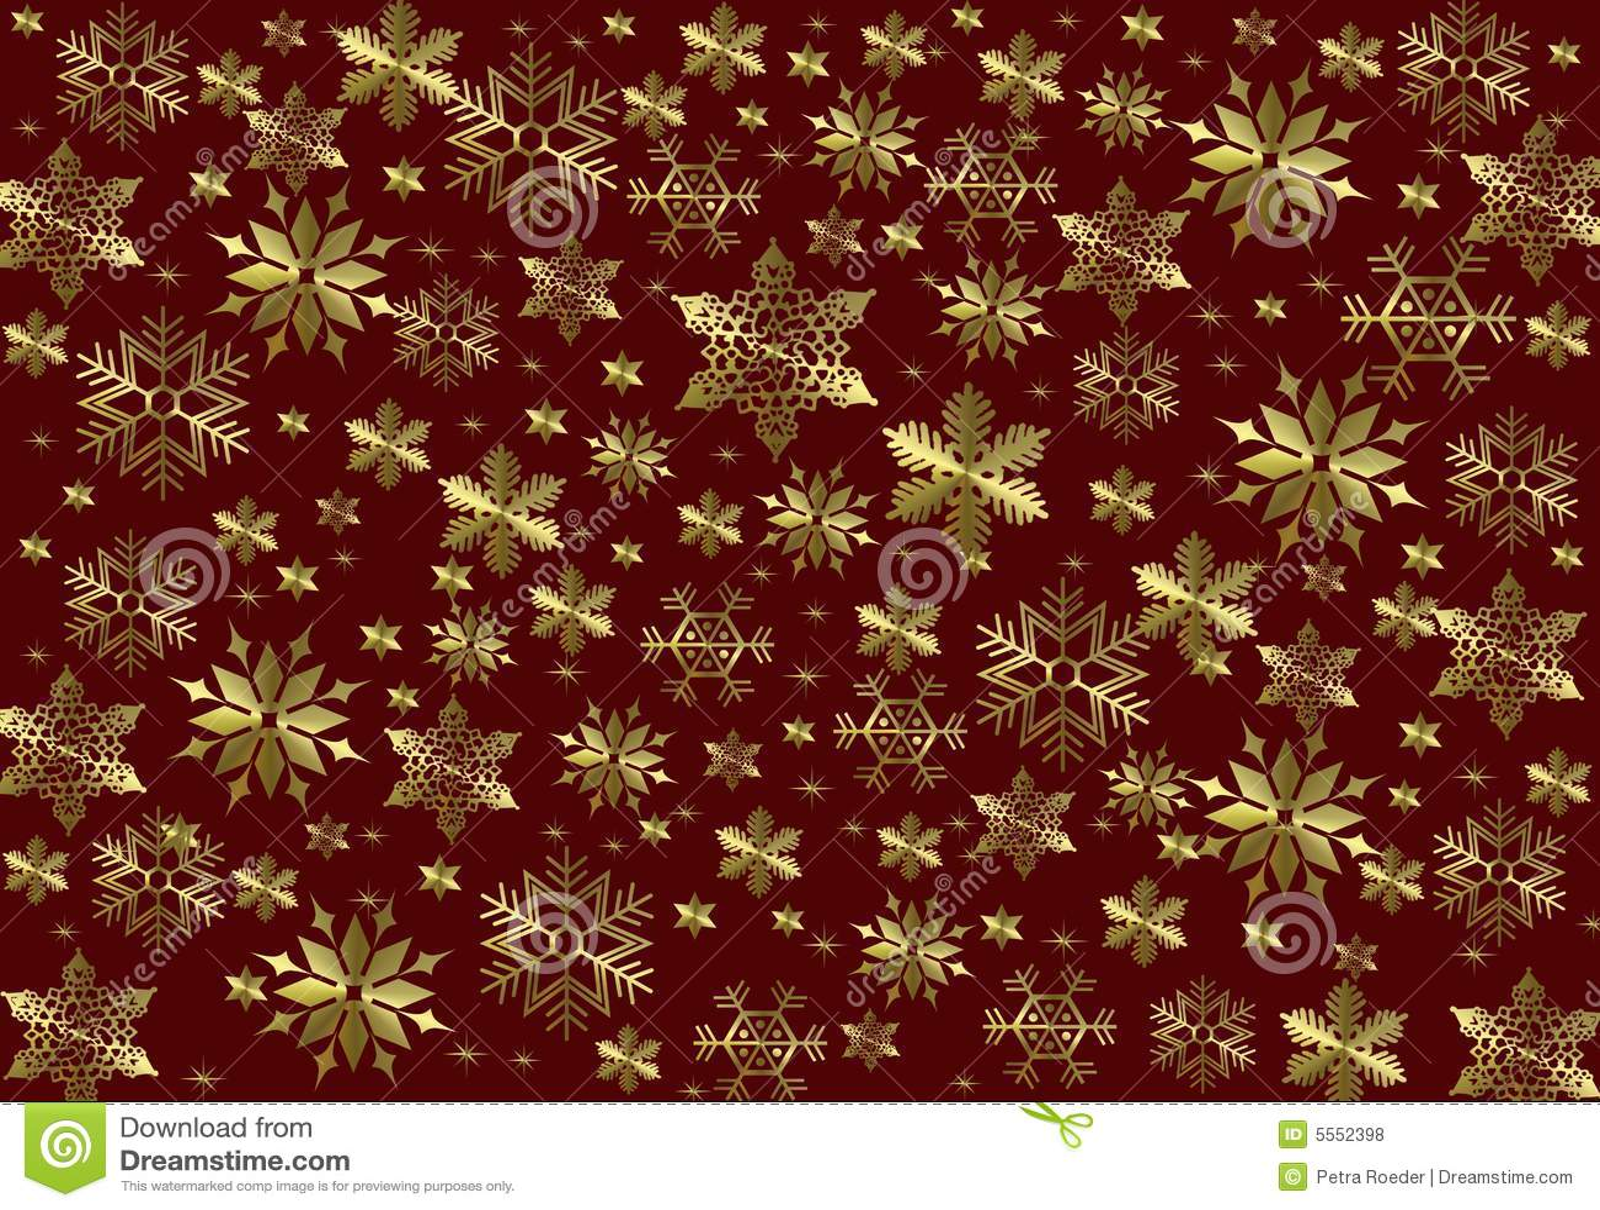 Gold Snowflake Background Royalty Free Stock Photos ...